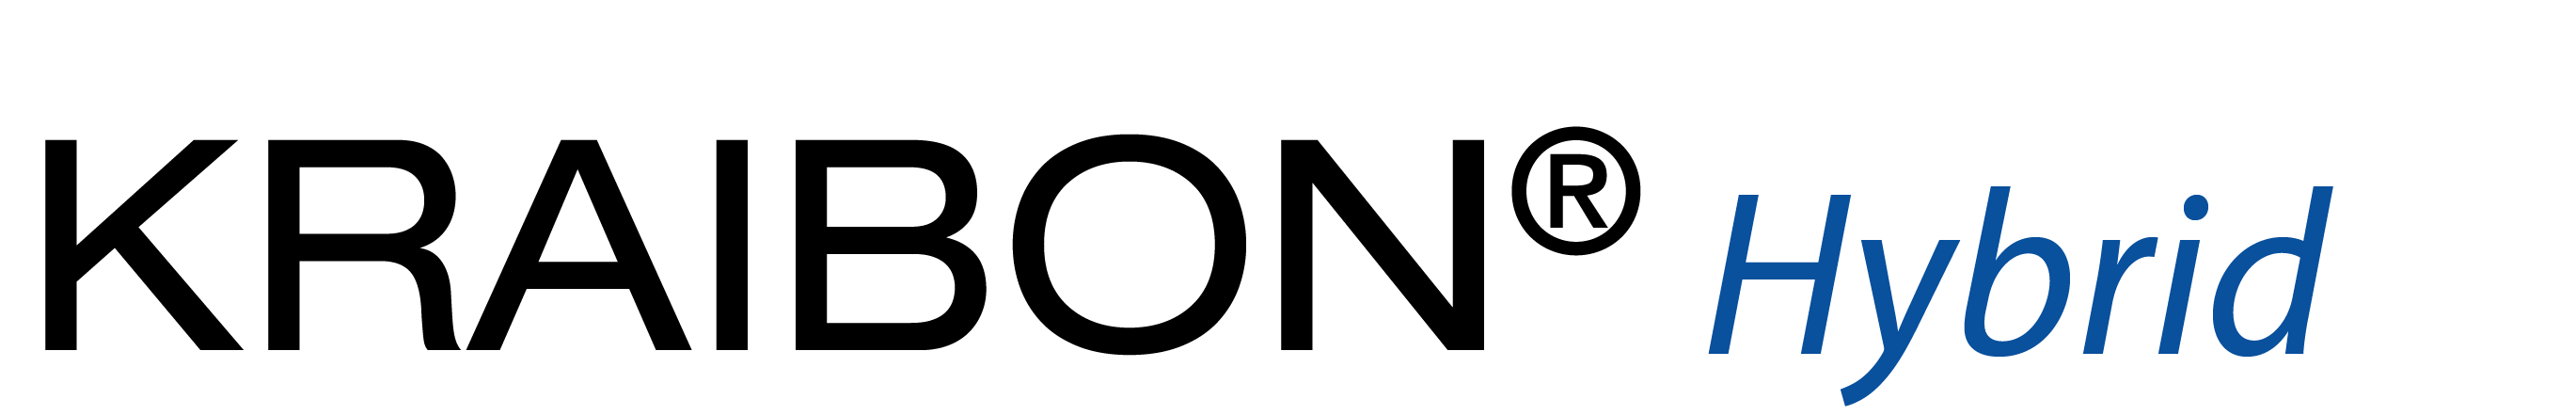 KRAIBON Hybrid blue